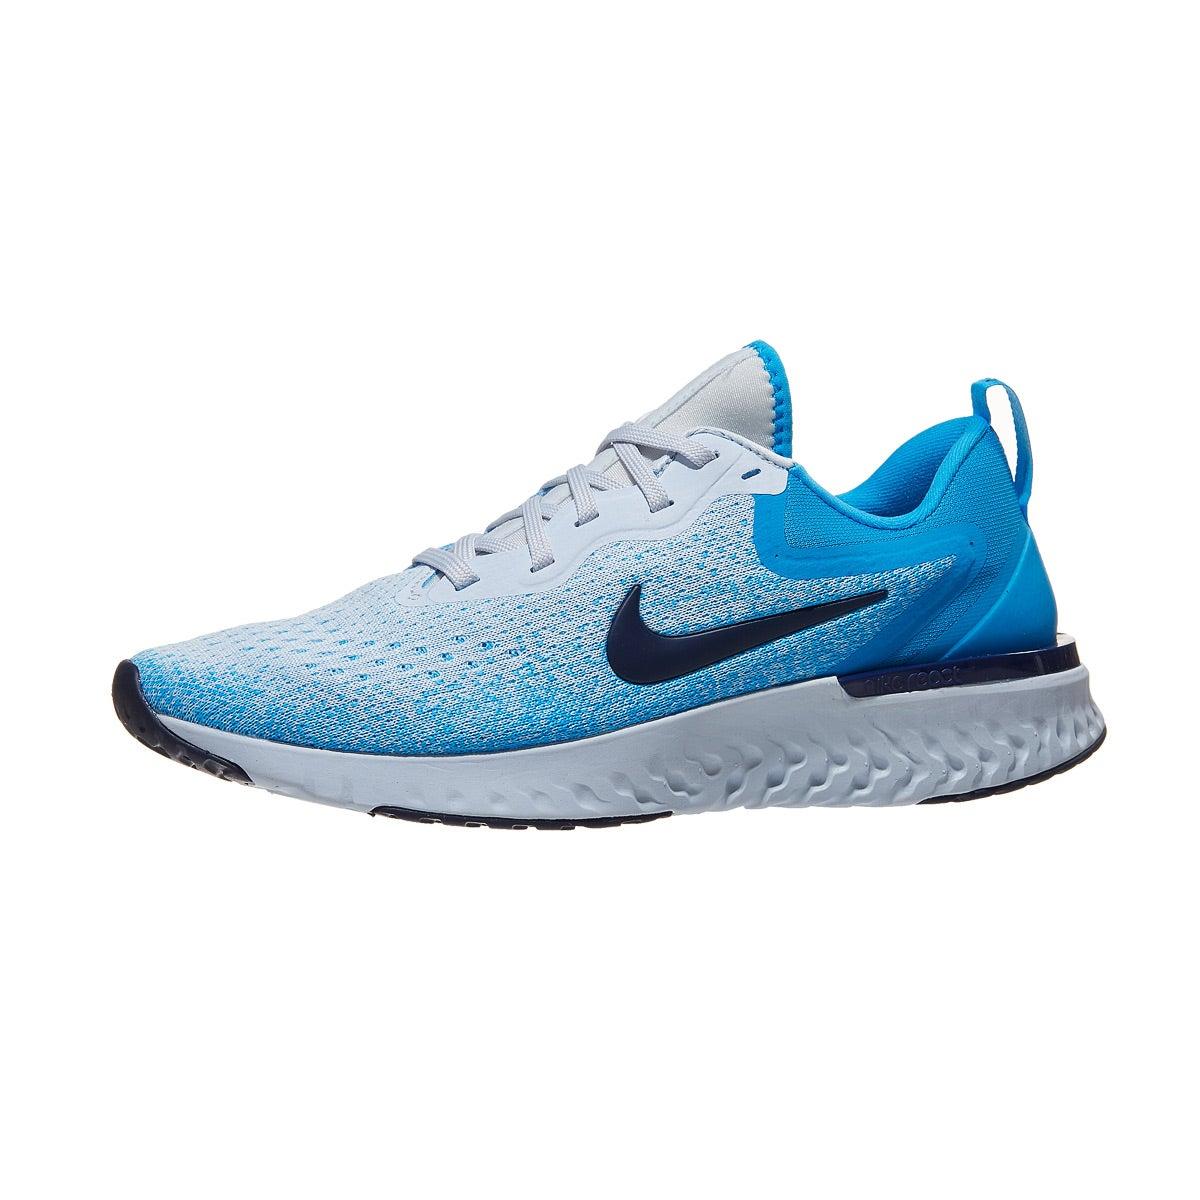 6195a8bd2612 Nike Odyssey React Women s Shoes Football Grey Blue 360° View ...